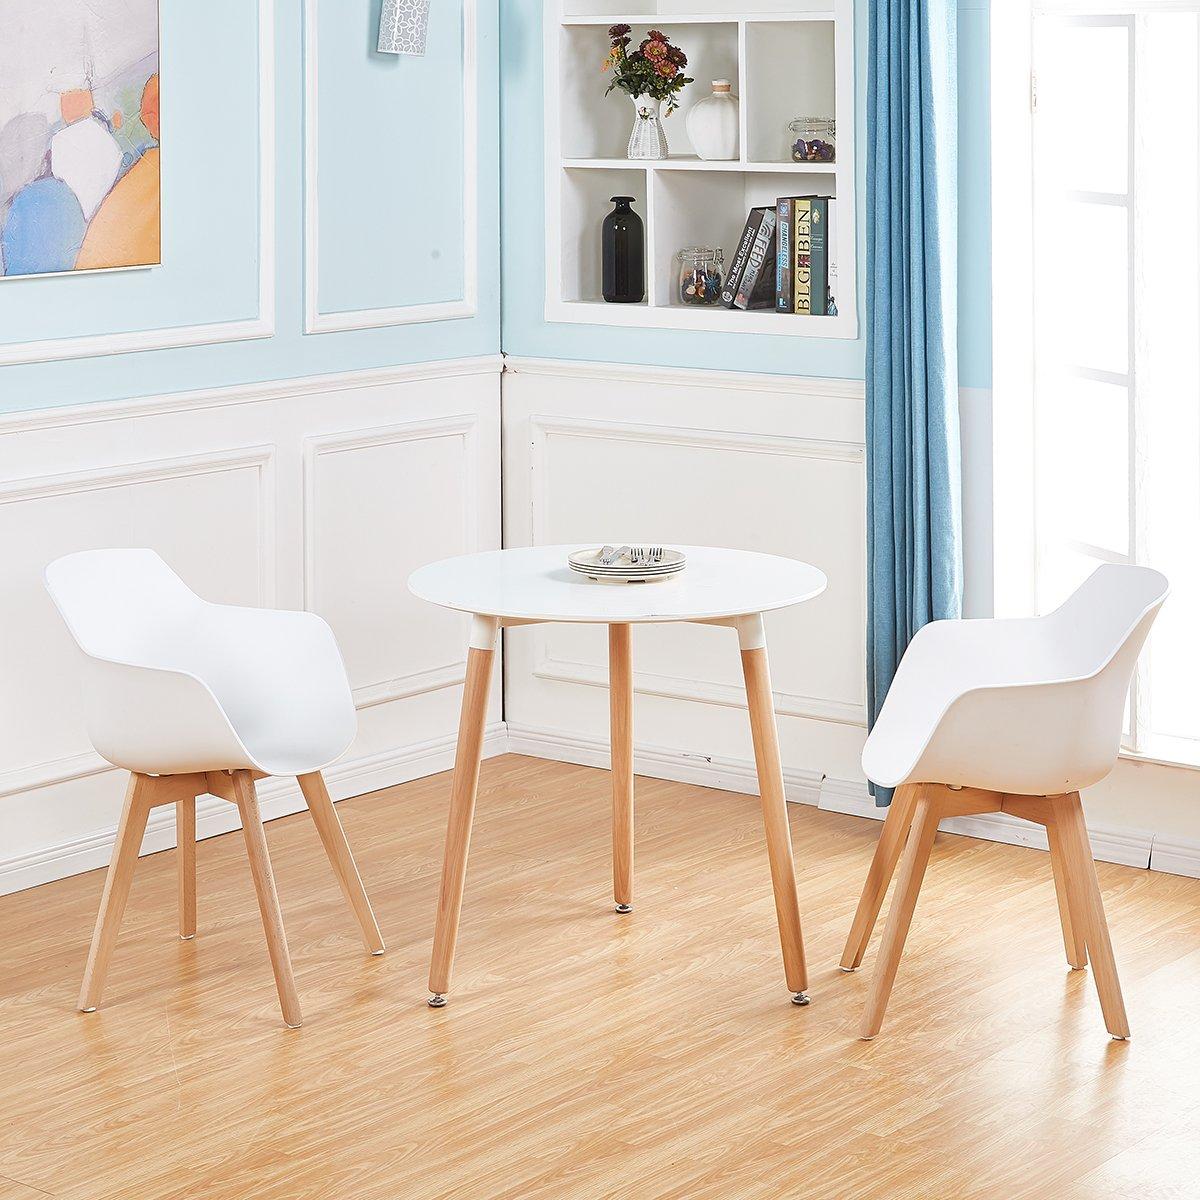 2 4 6 sedie da poltrona moderno design sedie cucina for Sedie design moderno